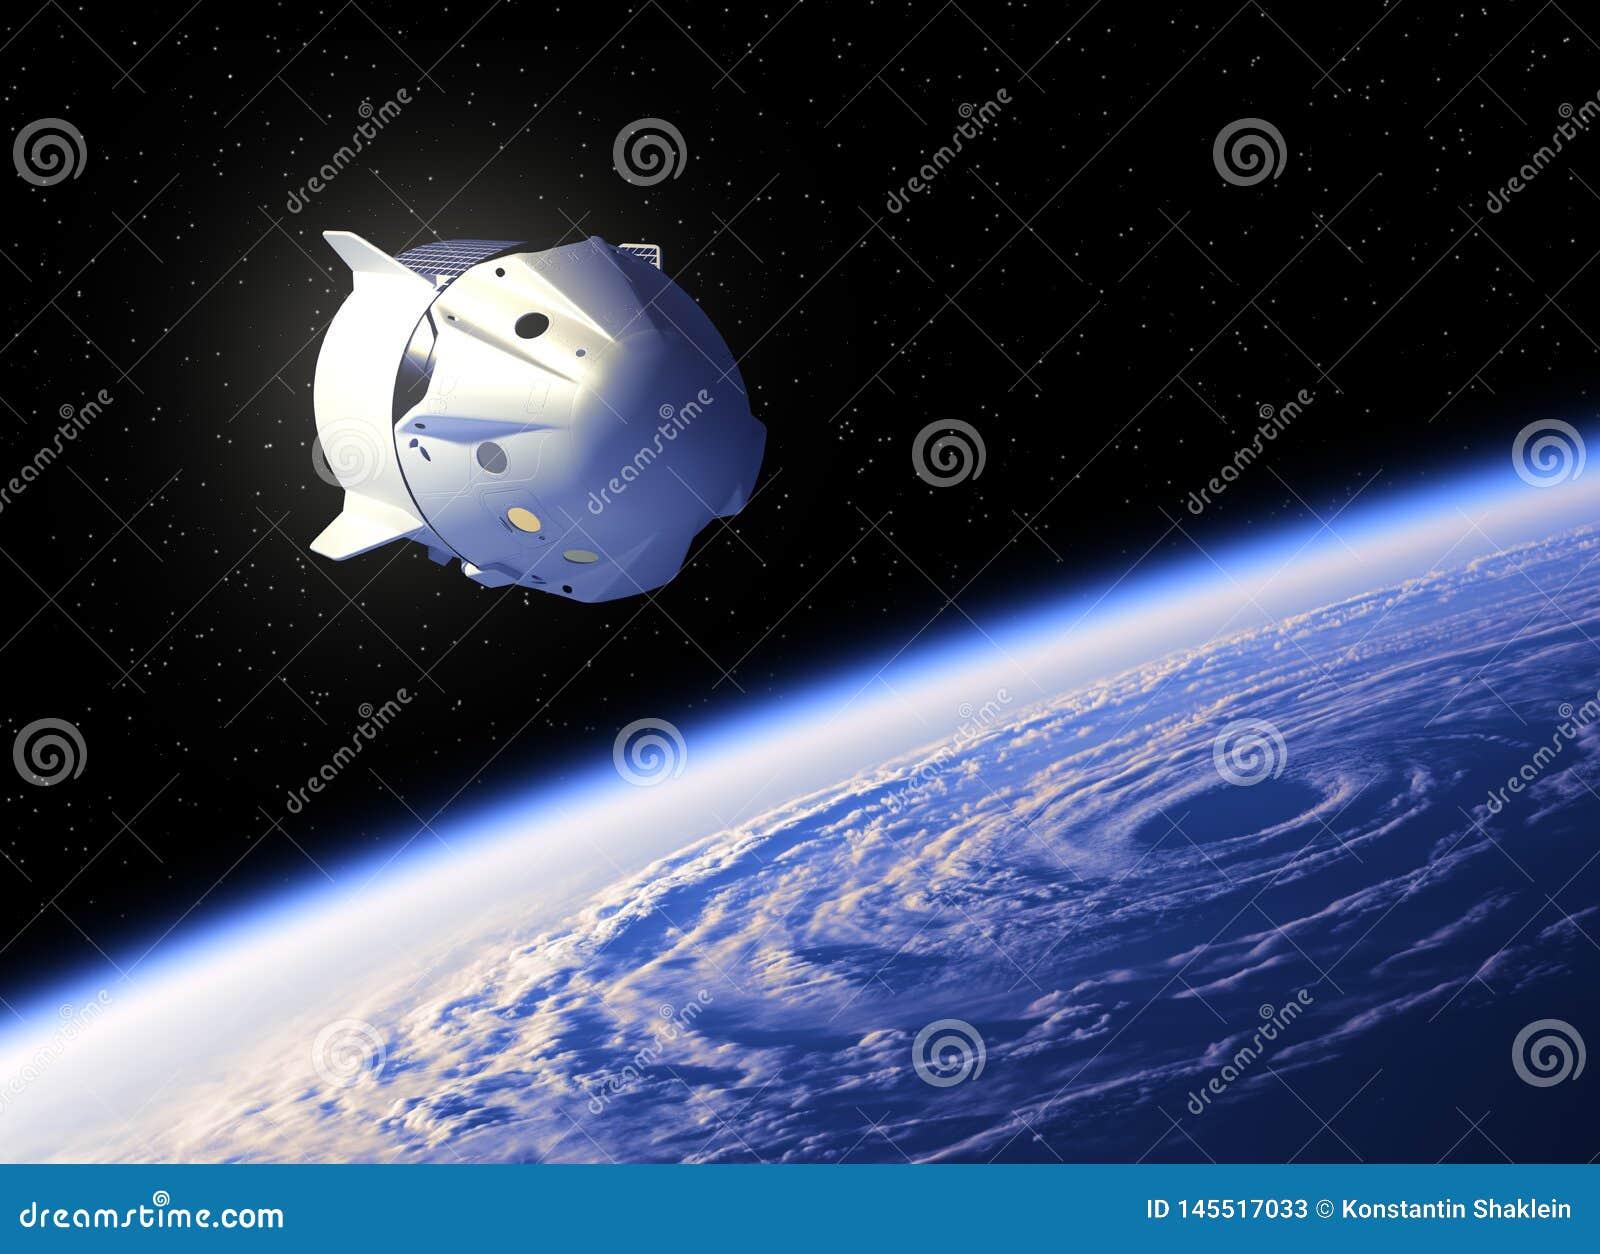 Flyg av det kommersiella rymdskeppet ovanf